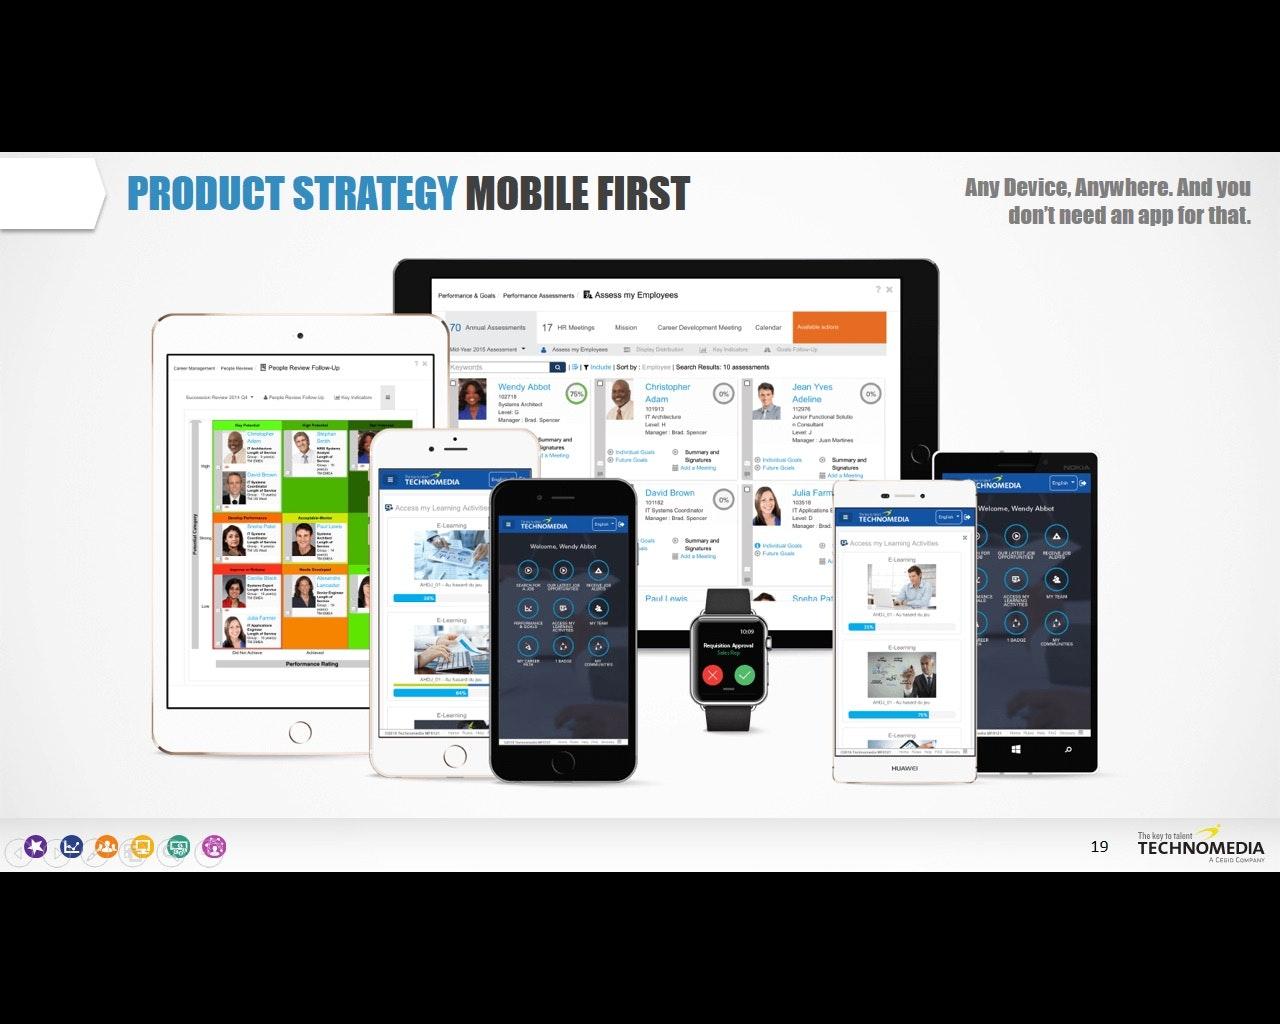 Mobile capabilities